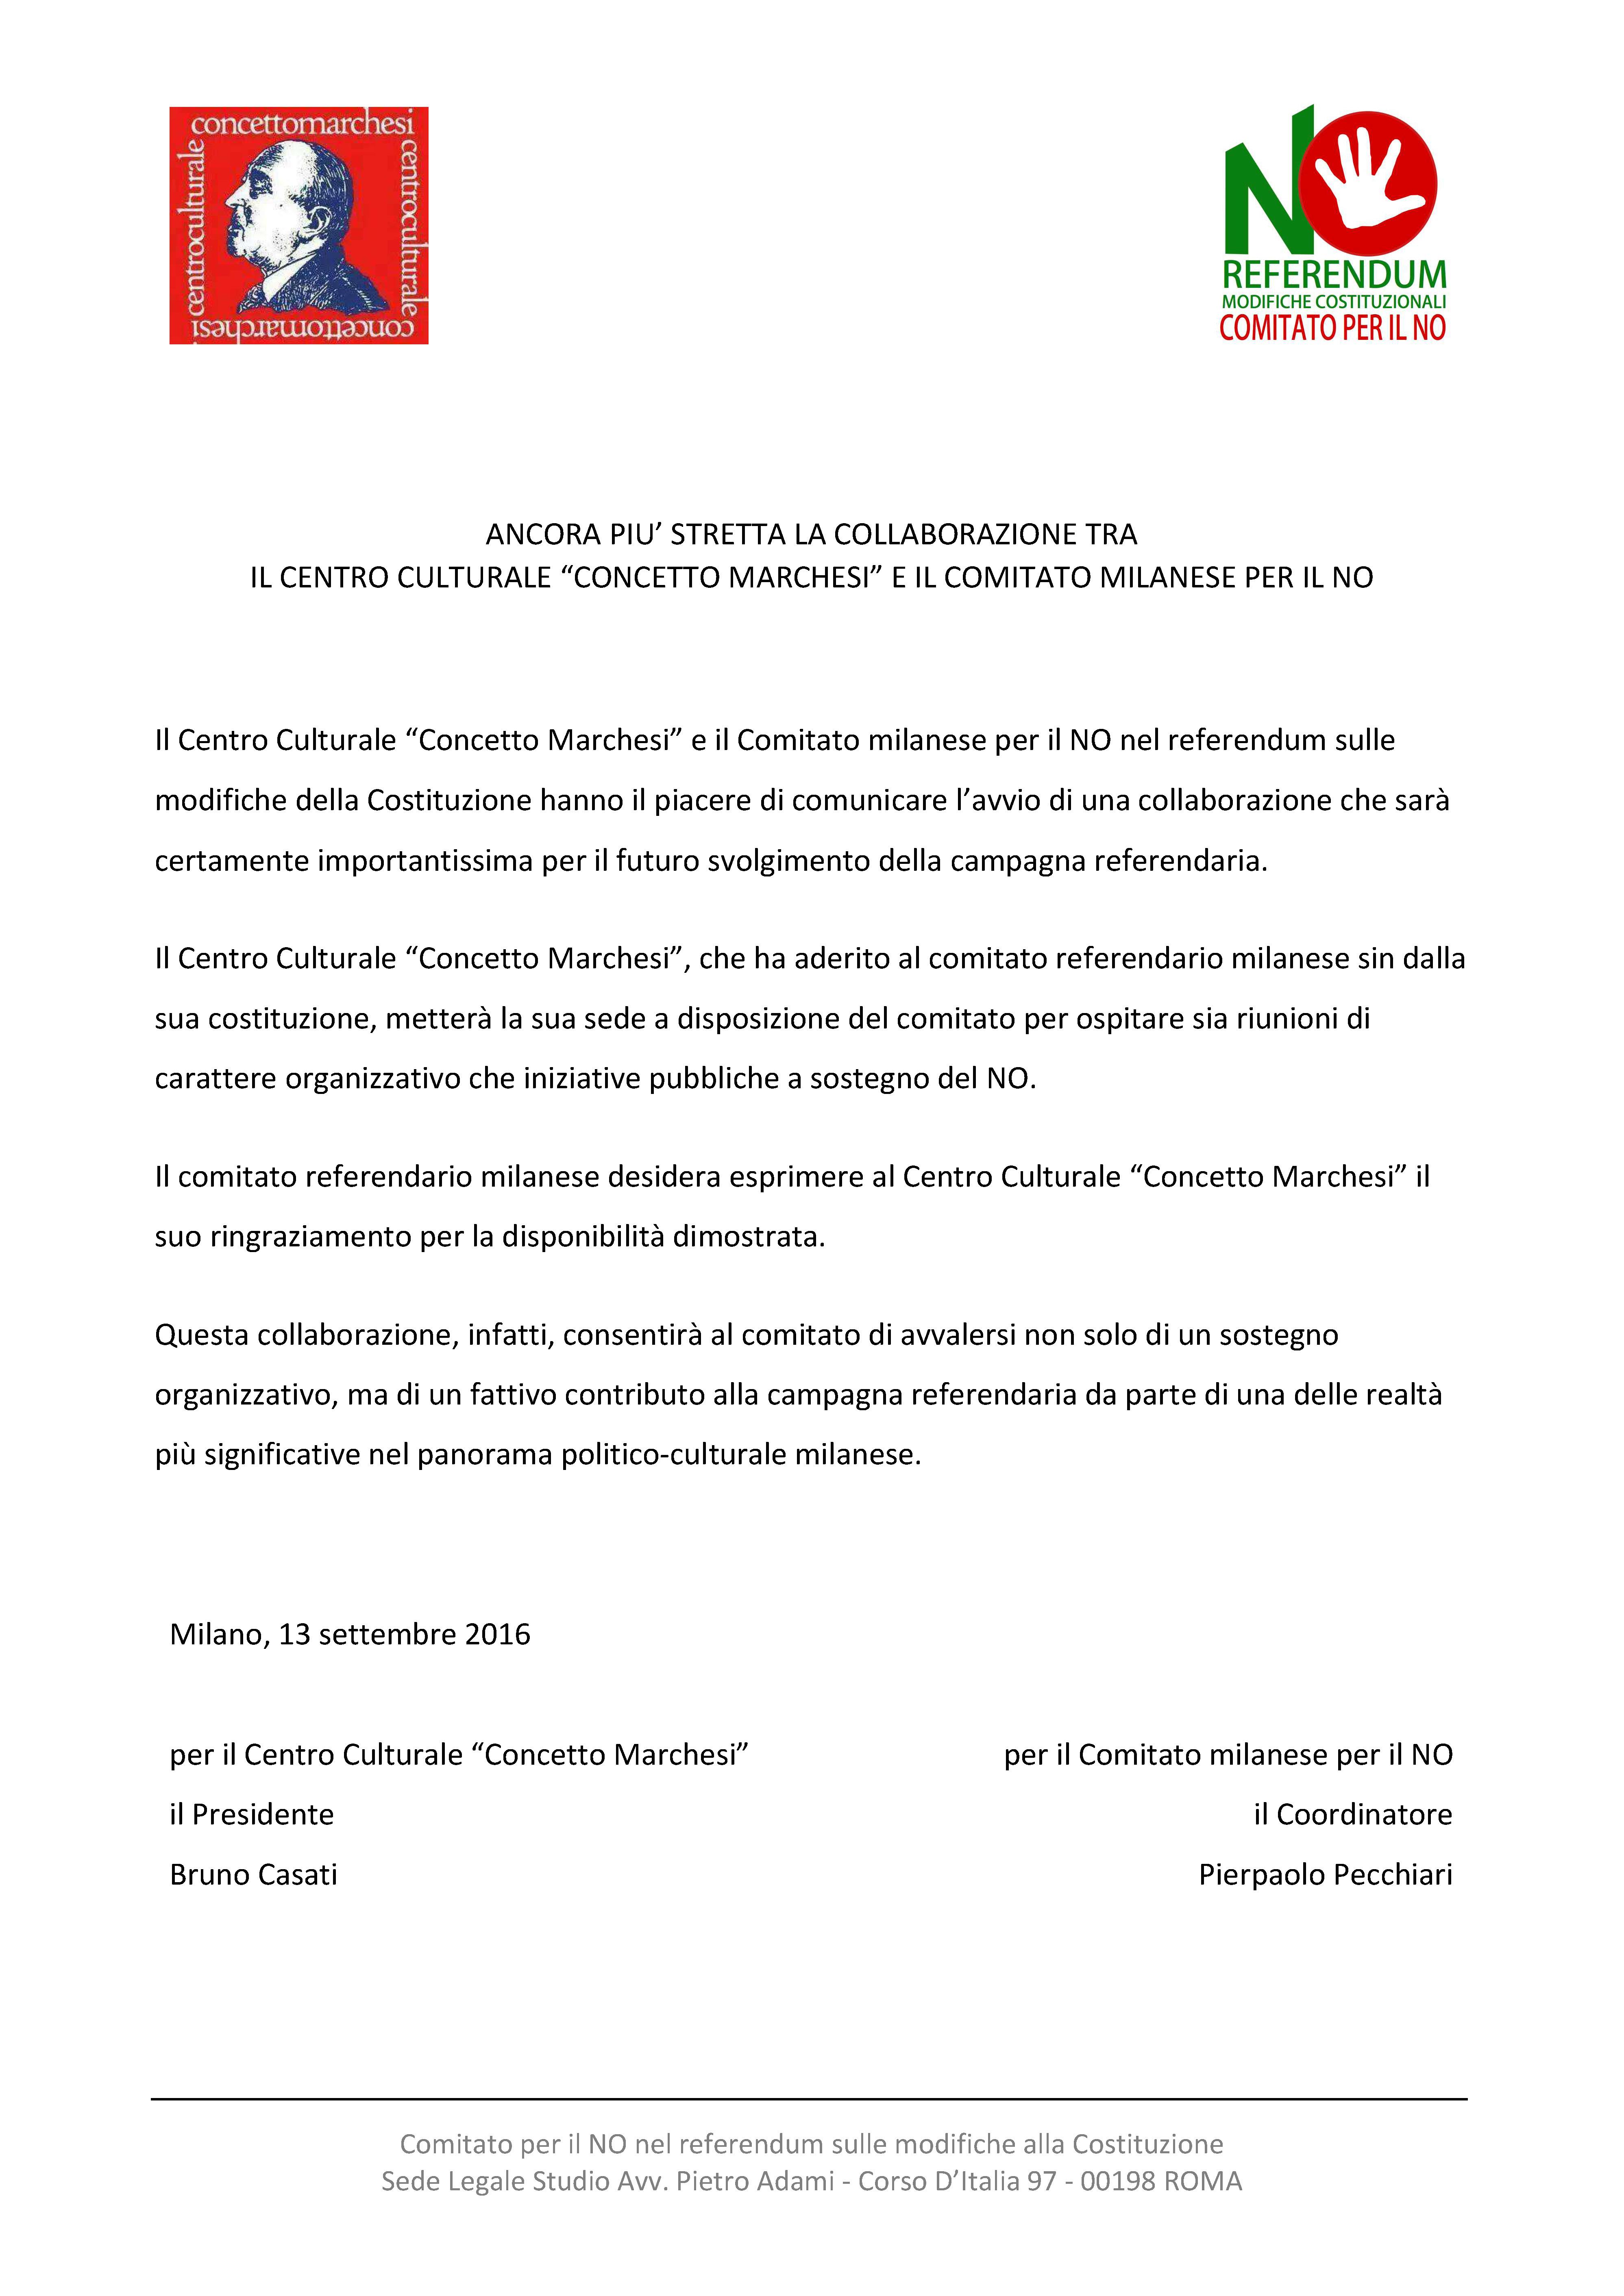 Comunicato congiunto CCCM-No